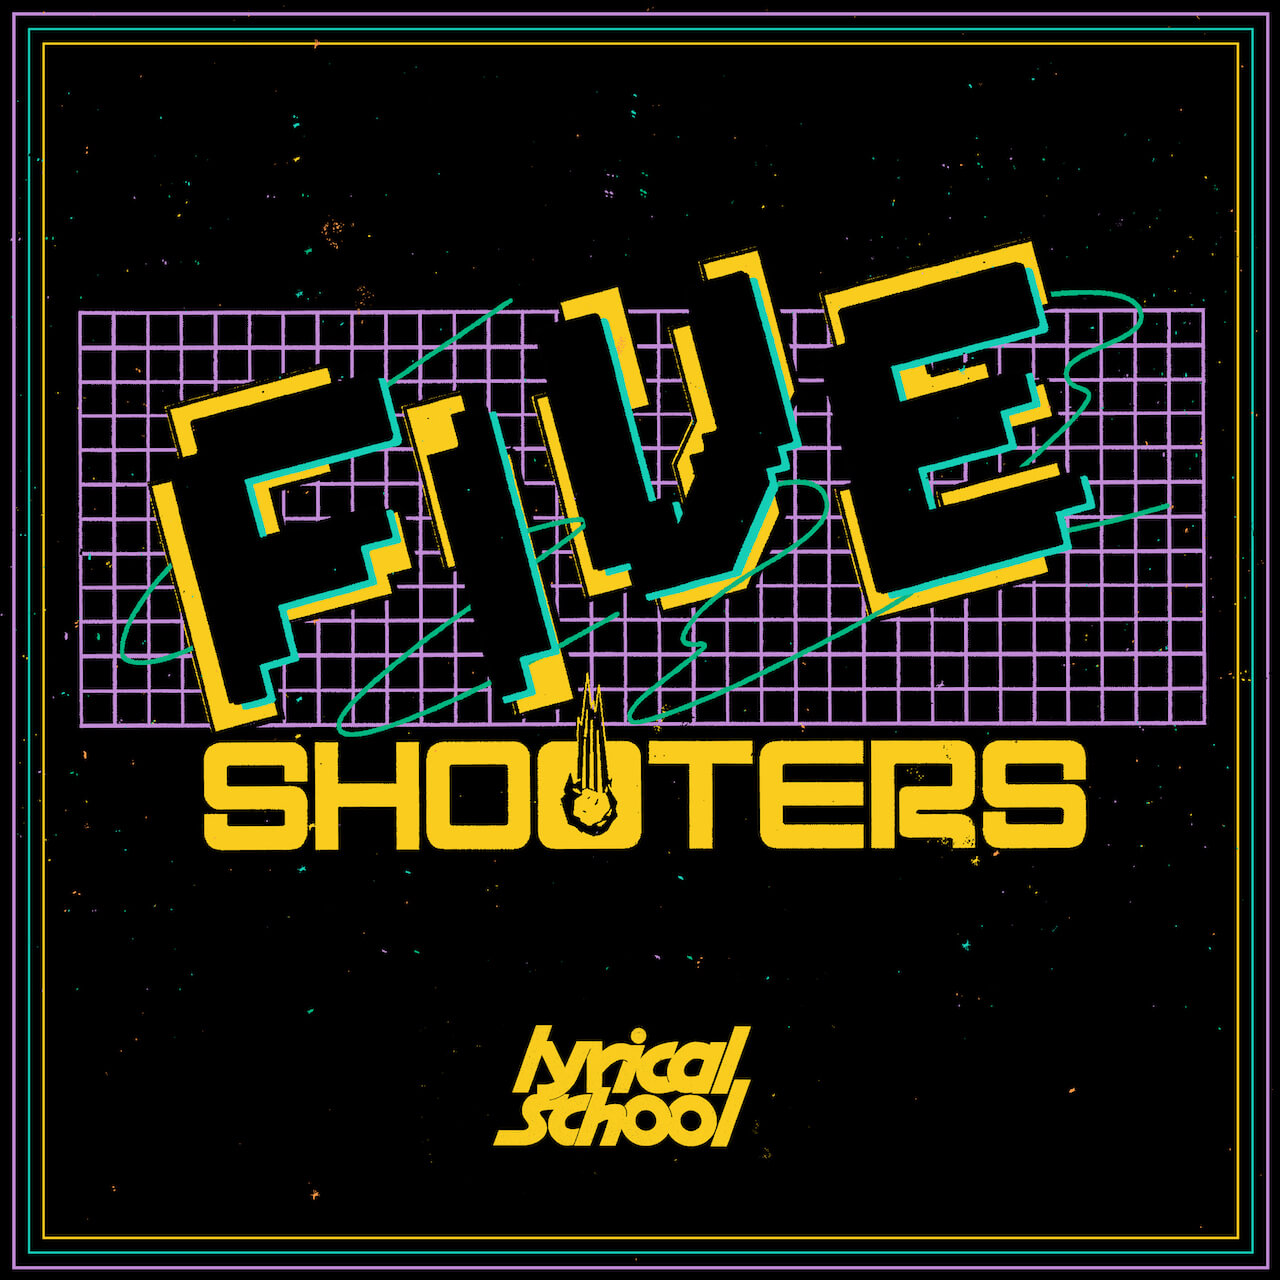 lyrical school、2021年1月リリースのアルバムよりvalknee作詞のシングル「FIVE SHOOTERS」のMVを公開 music201202-lyricalschool-2